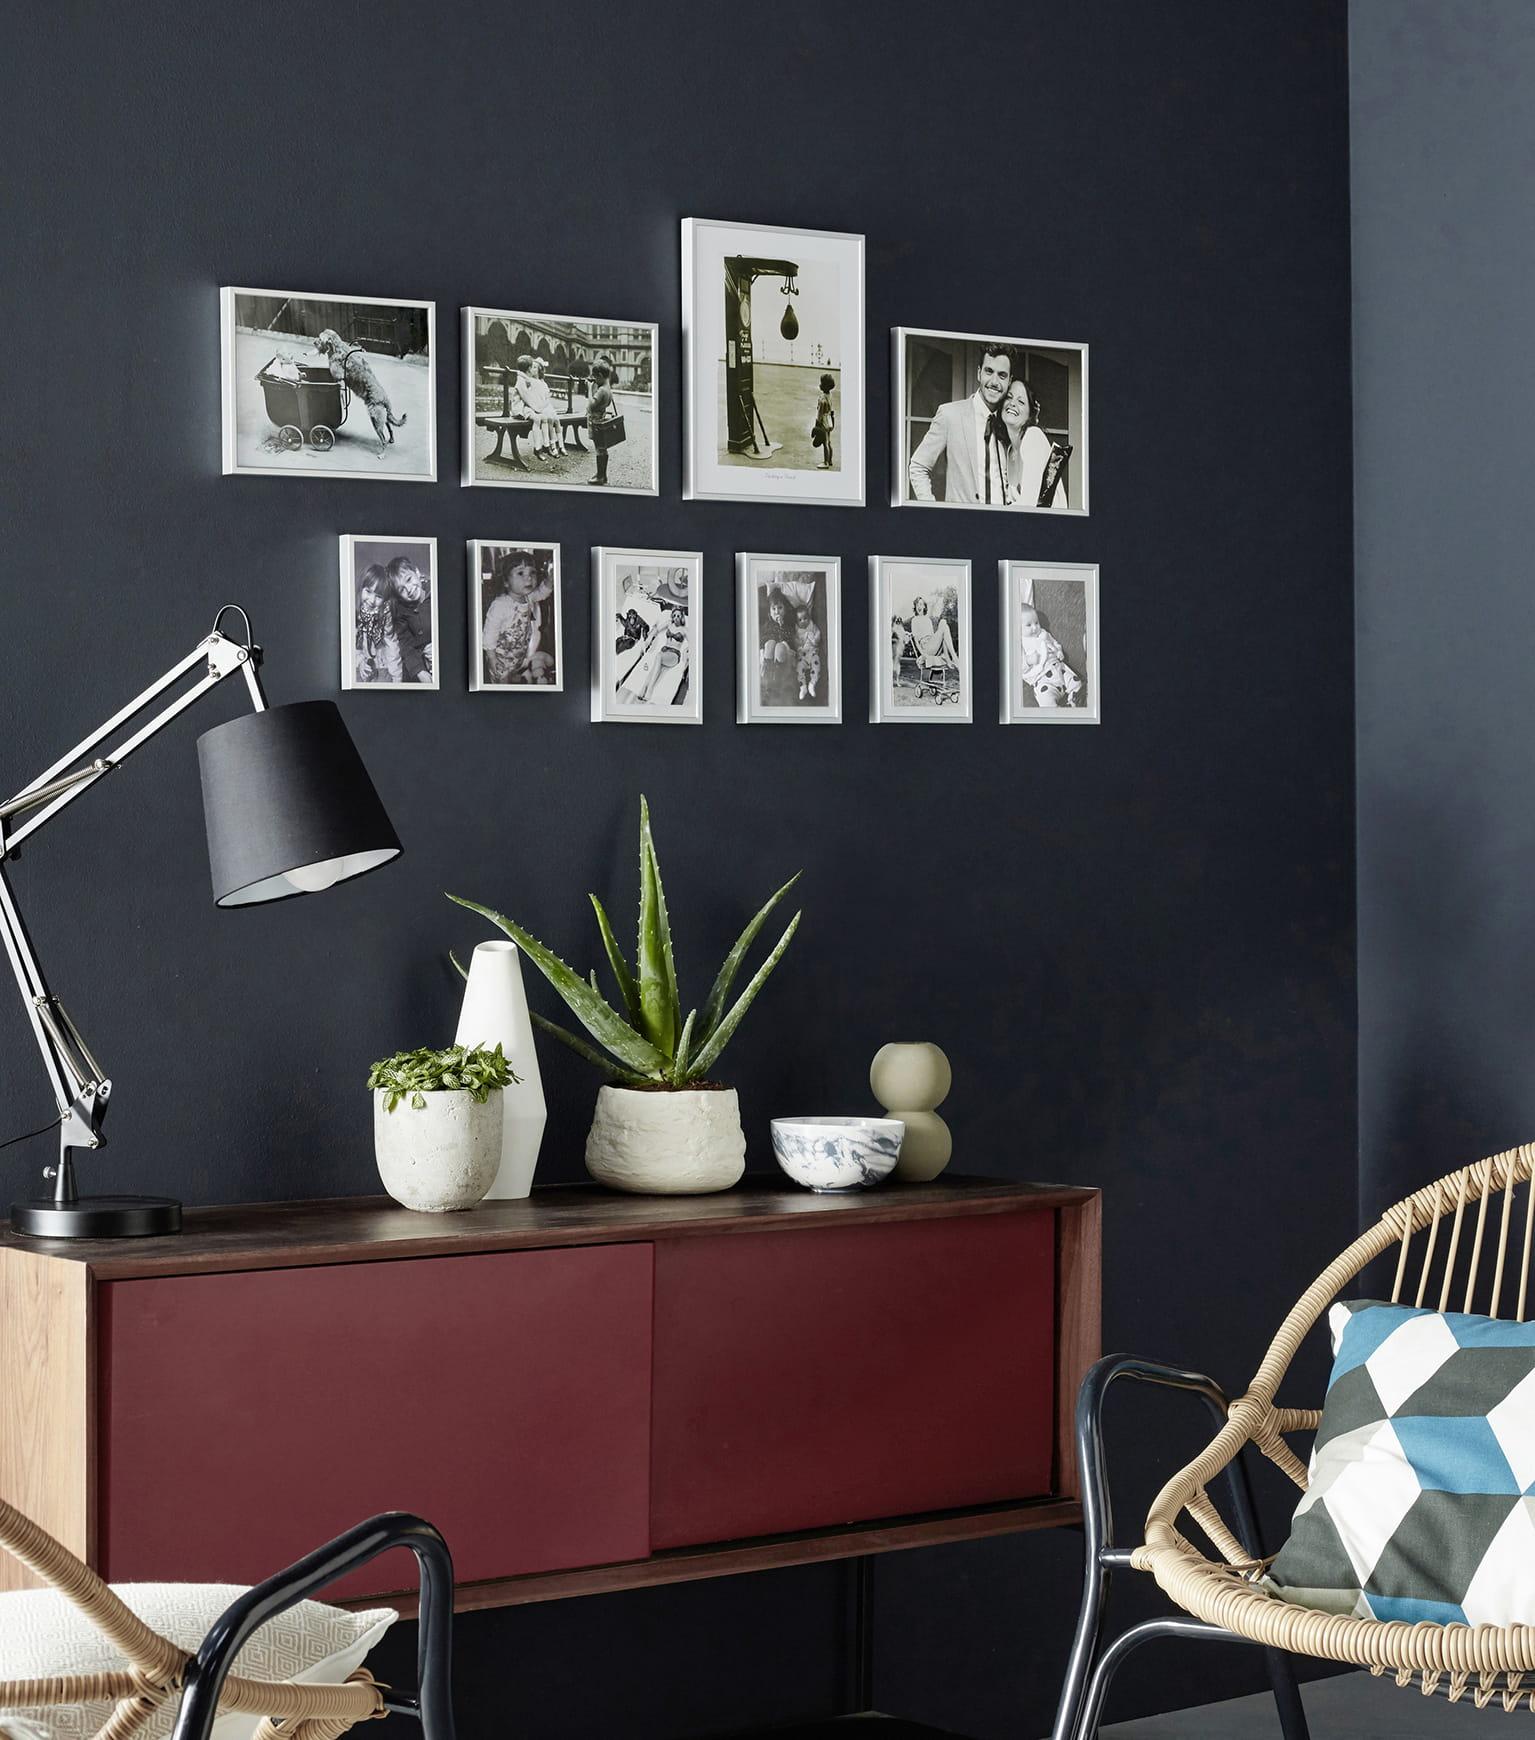 les erreurs viter avec une pi ce sombre. Black Bedroom Furniture Sets. Home Design Ideas